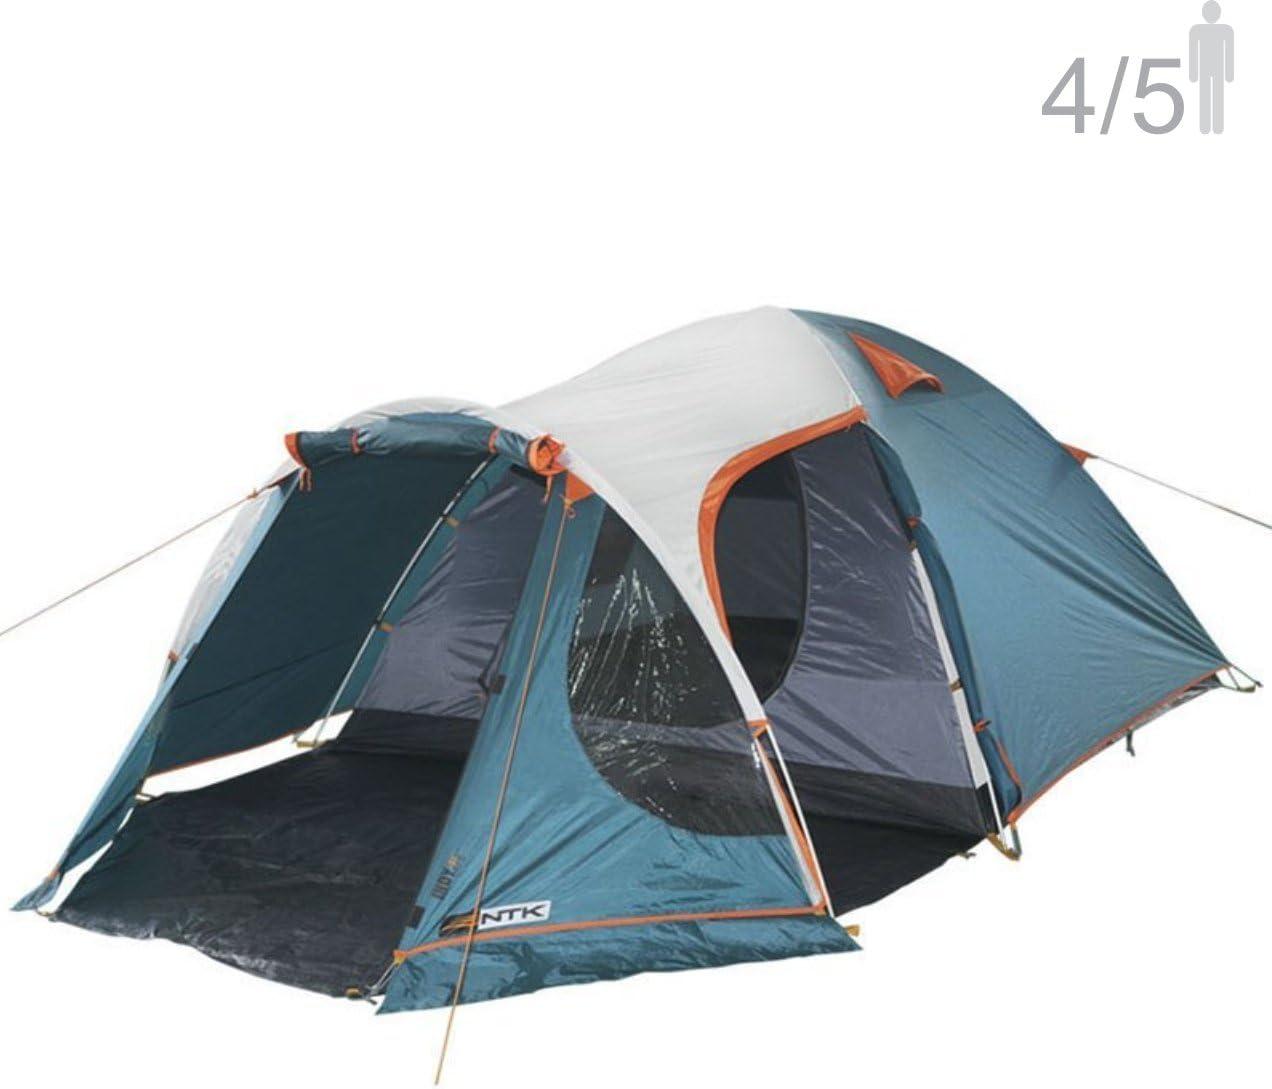 Best Waterproof Tents 2020